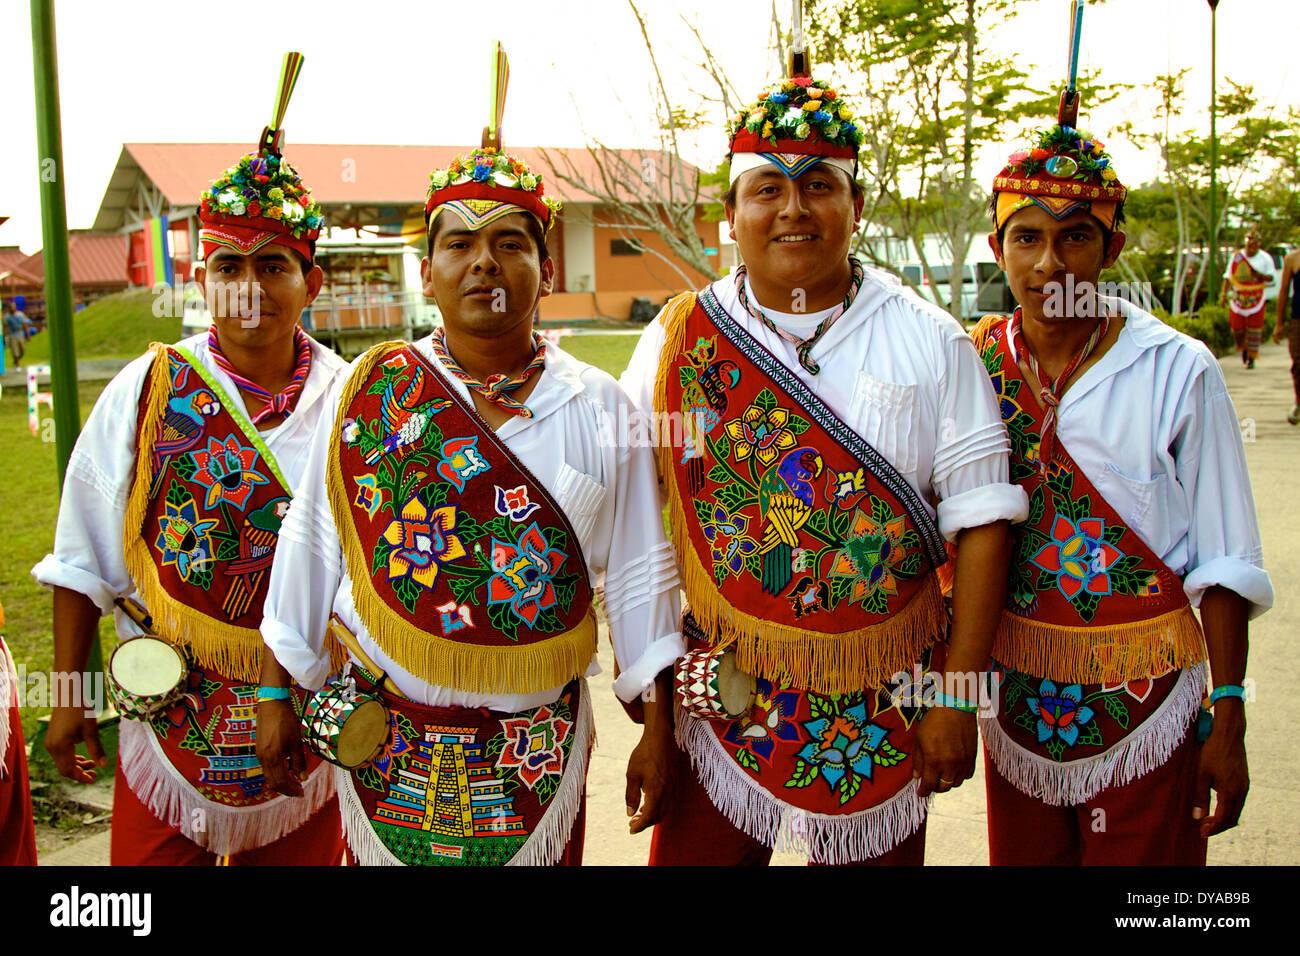 Voladores, pre-hispanic ritual, Mexico, papantla flyers - Stock Image